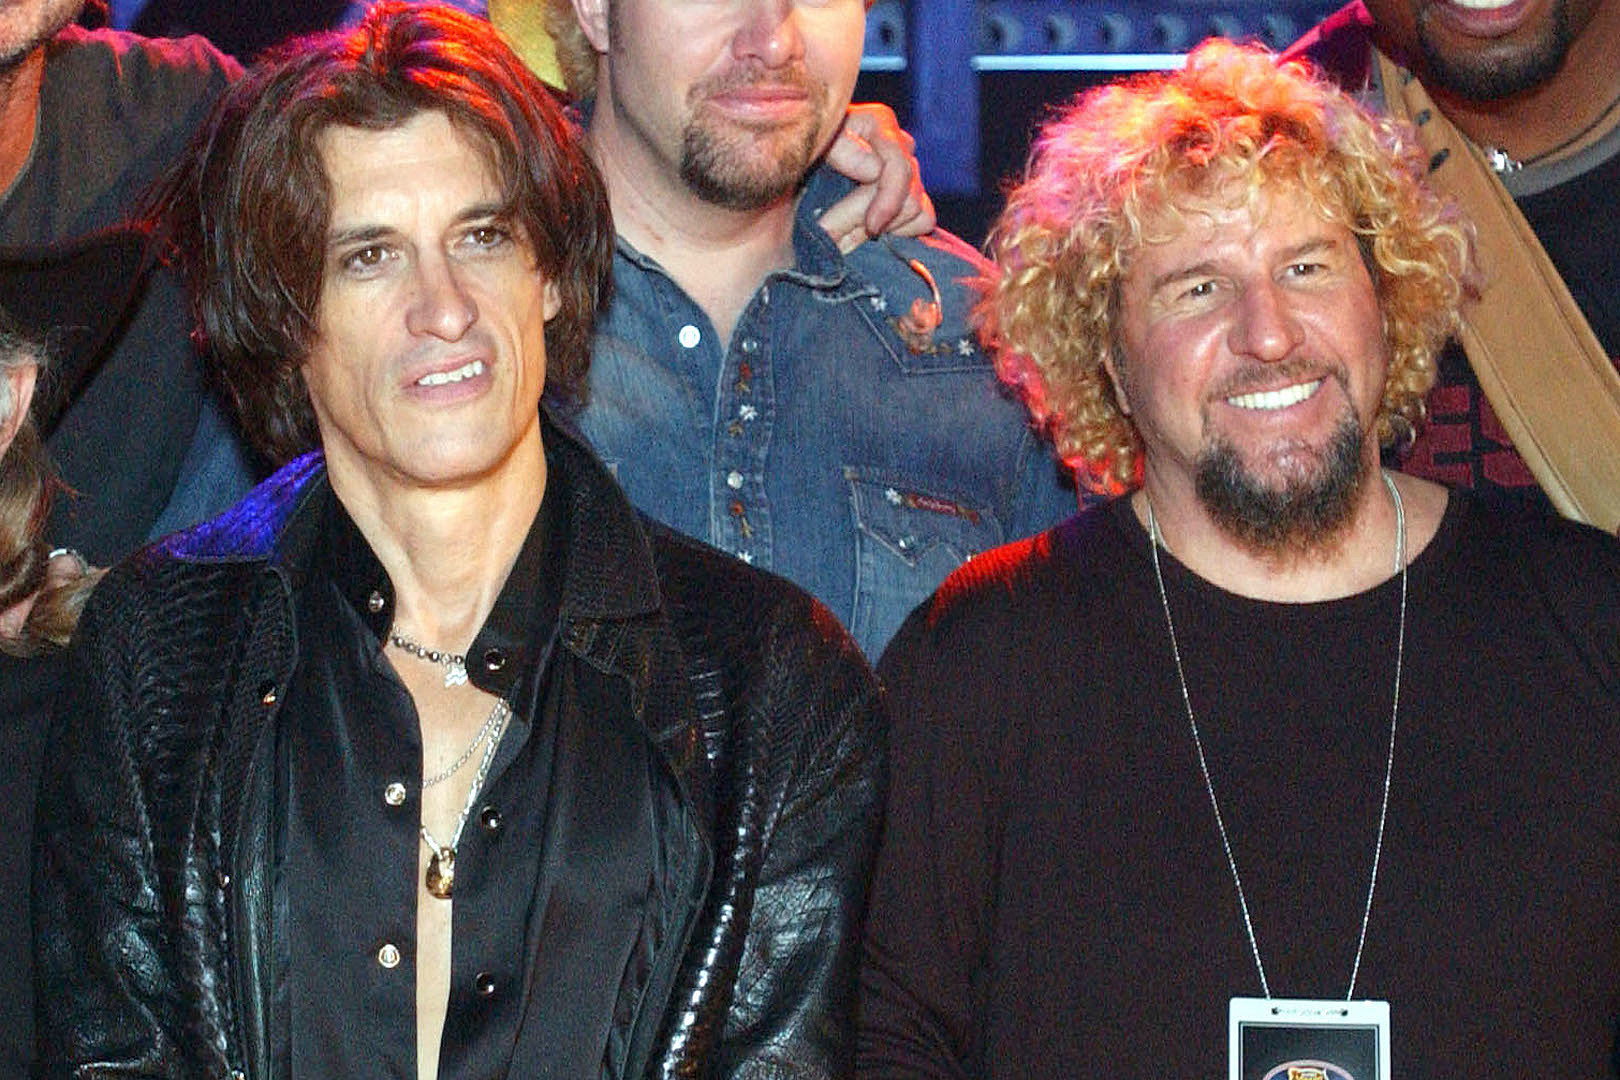 Aerosmith Almost Replaced Steven Tyler With Sammy Hagar